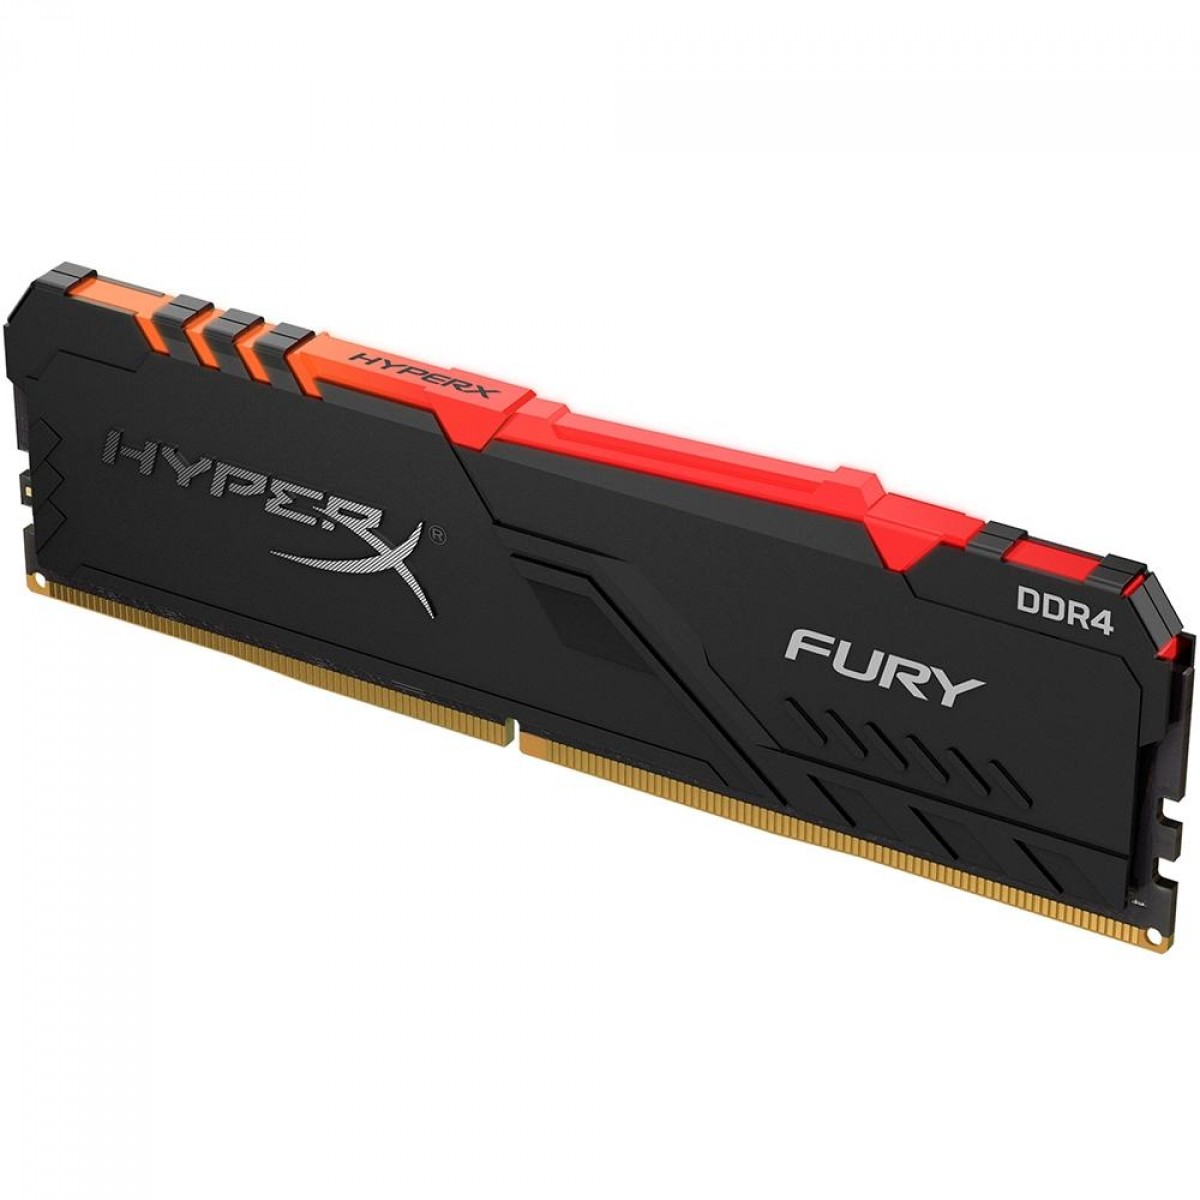 Memória DDR4 Kingston HyperX Fury RGB, 16GB, 2666MHz, Black, HX426C16FB3A/16